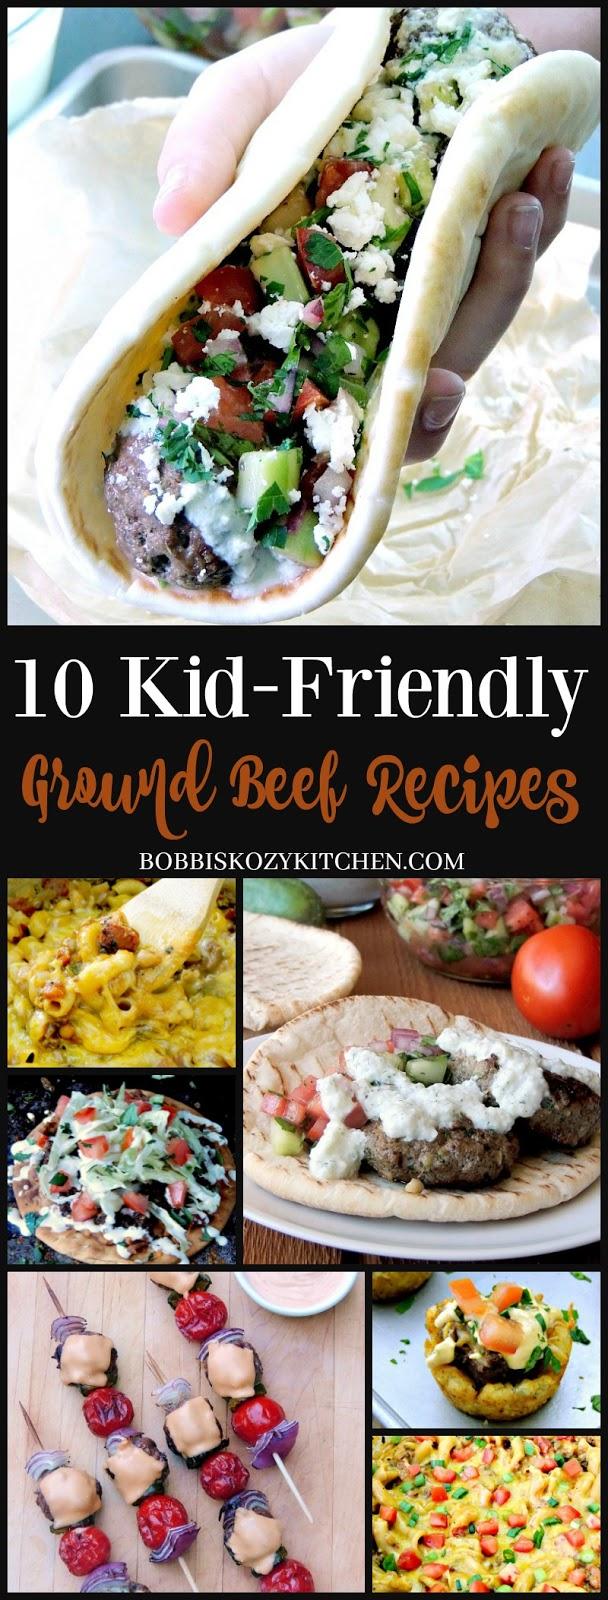 10 Easy to Make Kid-Friendly Ground Beef Recipes | Bobbi's ...